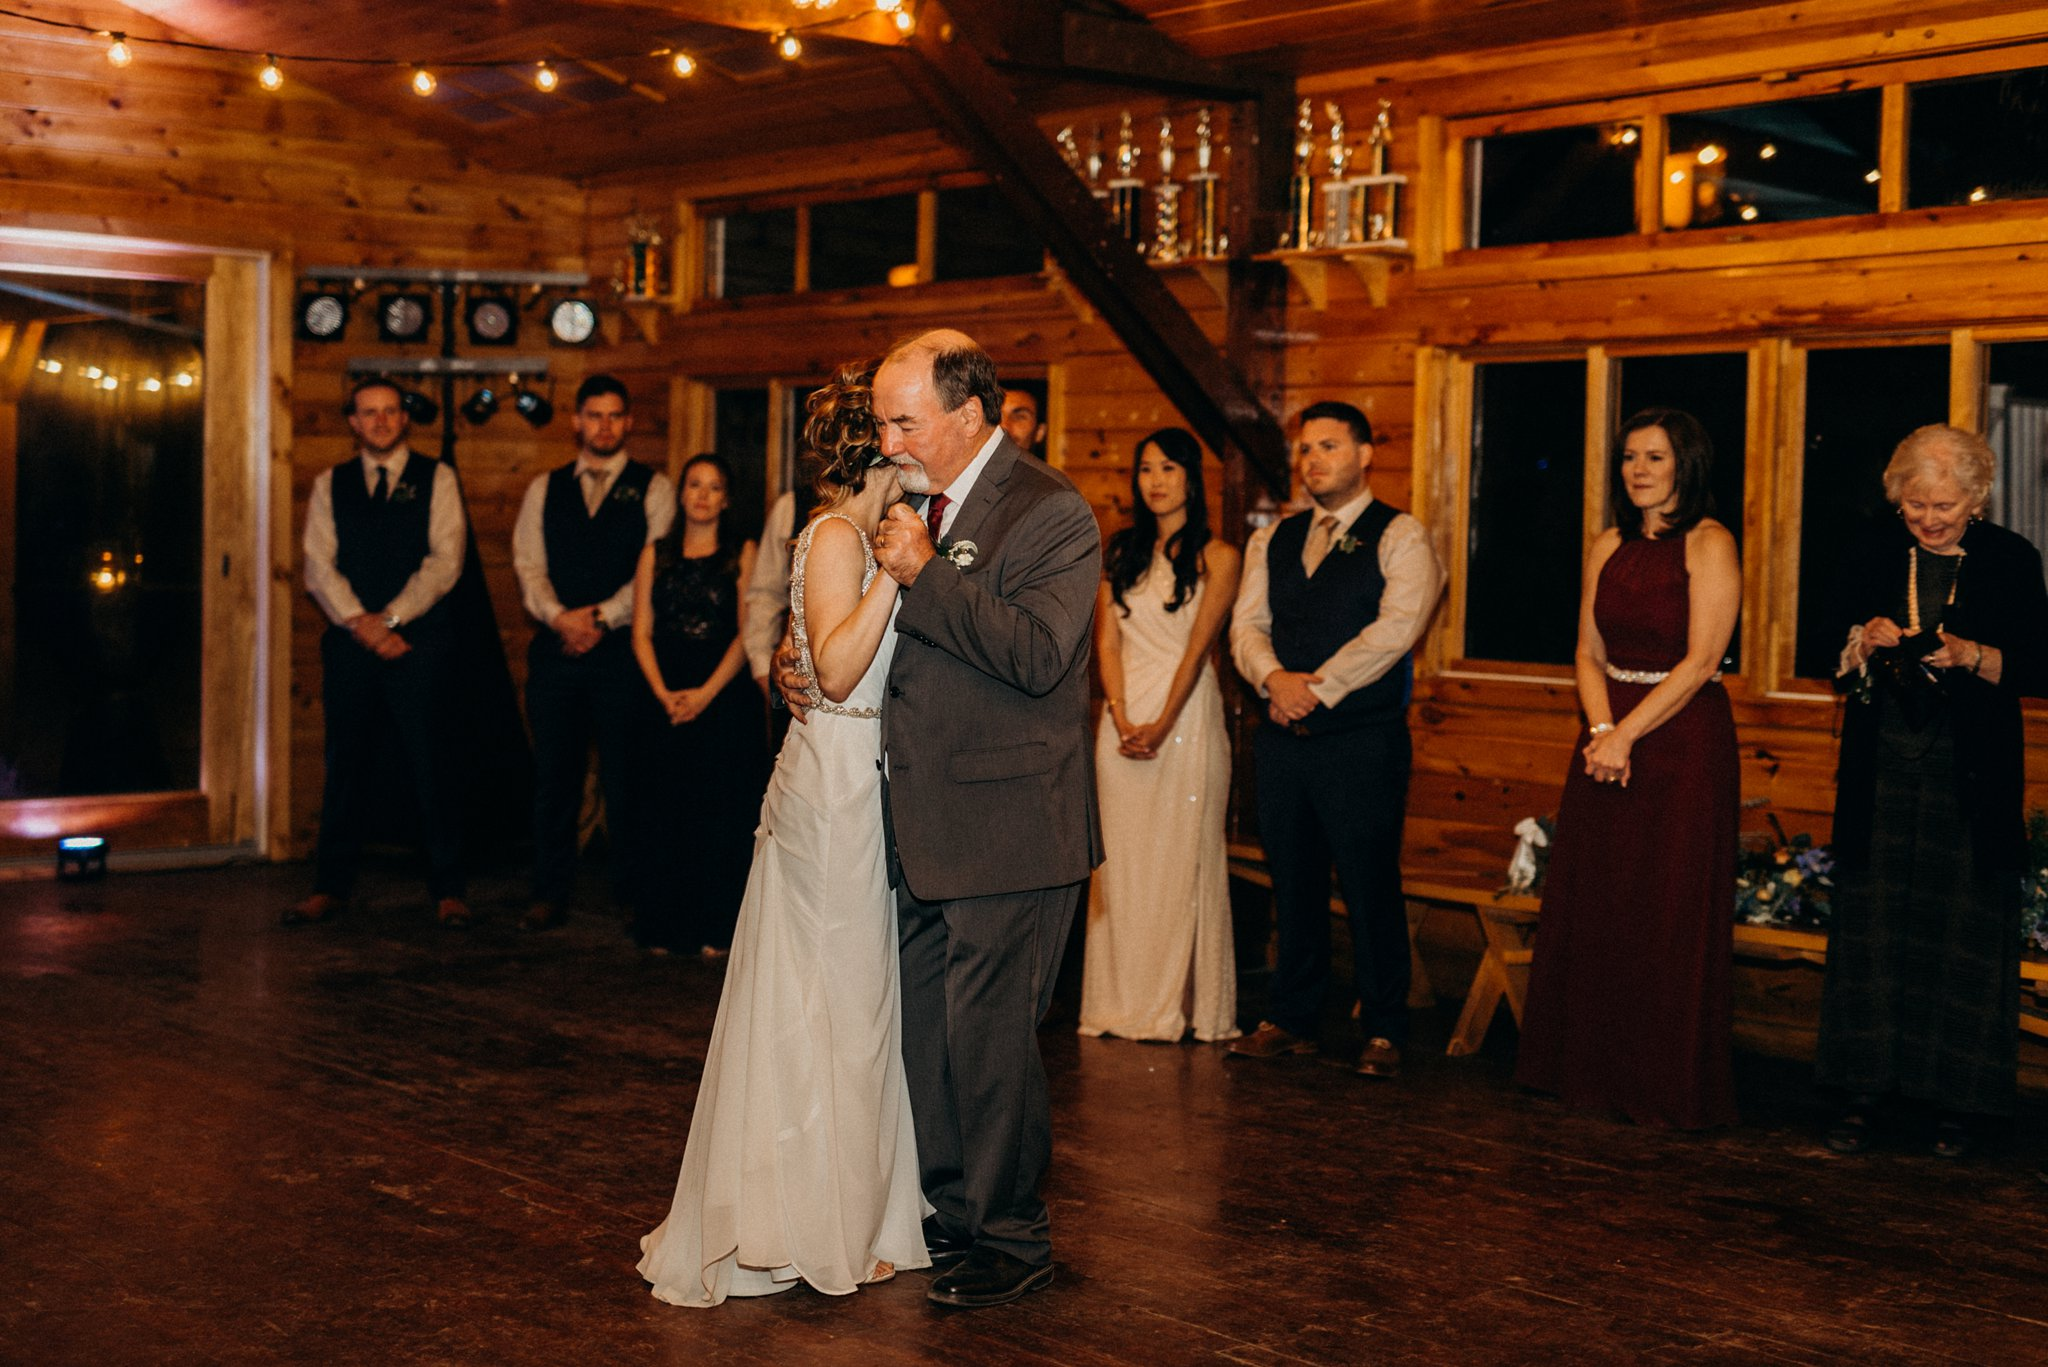 kaihla_tonai_intimate_wedding_elopement_photographer_6672.jpg